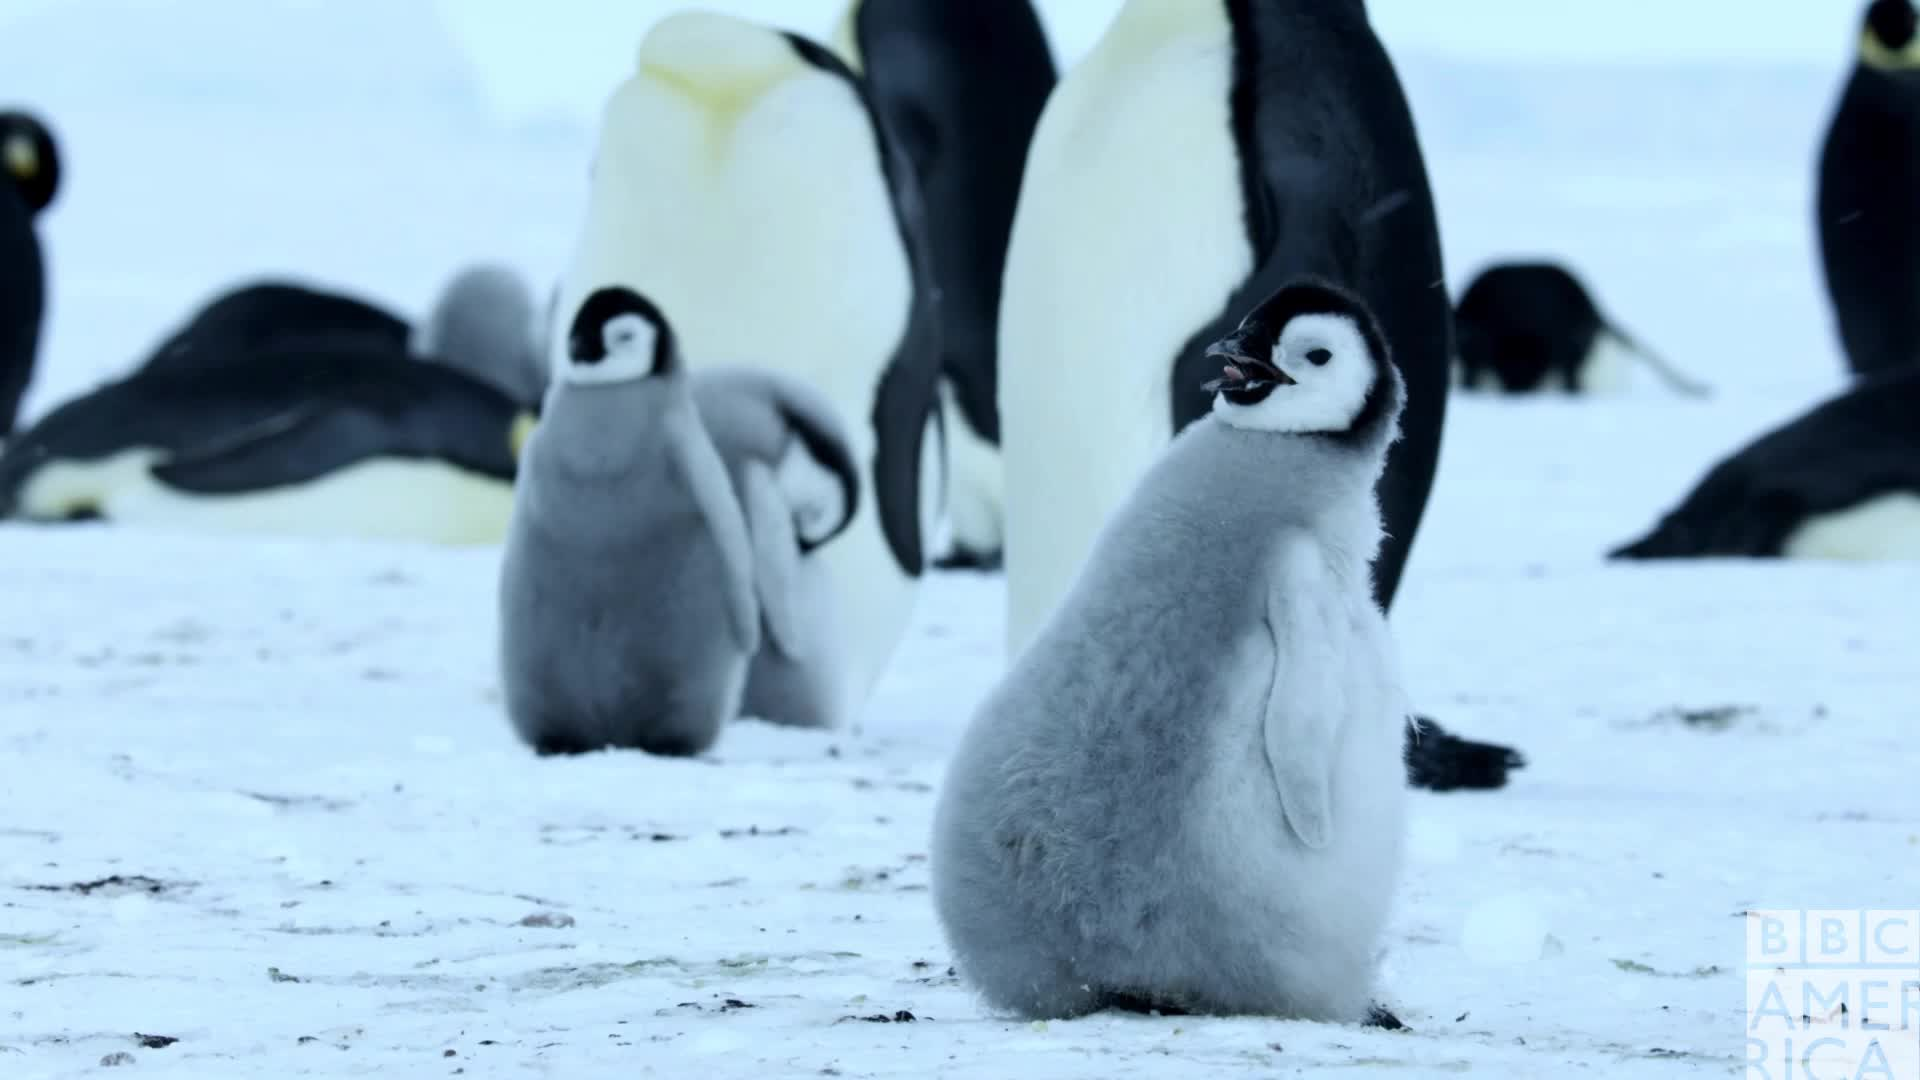 animal, animals, bbc america, bbc america dynasties, bbc america: dynasties, dynasties, emperor penguin, emperor penguins, penguin, penguins, sleep, sleepy, tired, zzz, Dynasties Sleepy Penguin Chick GIFs